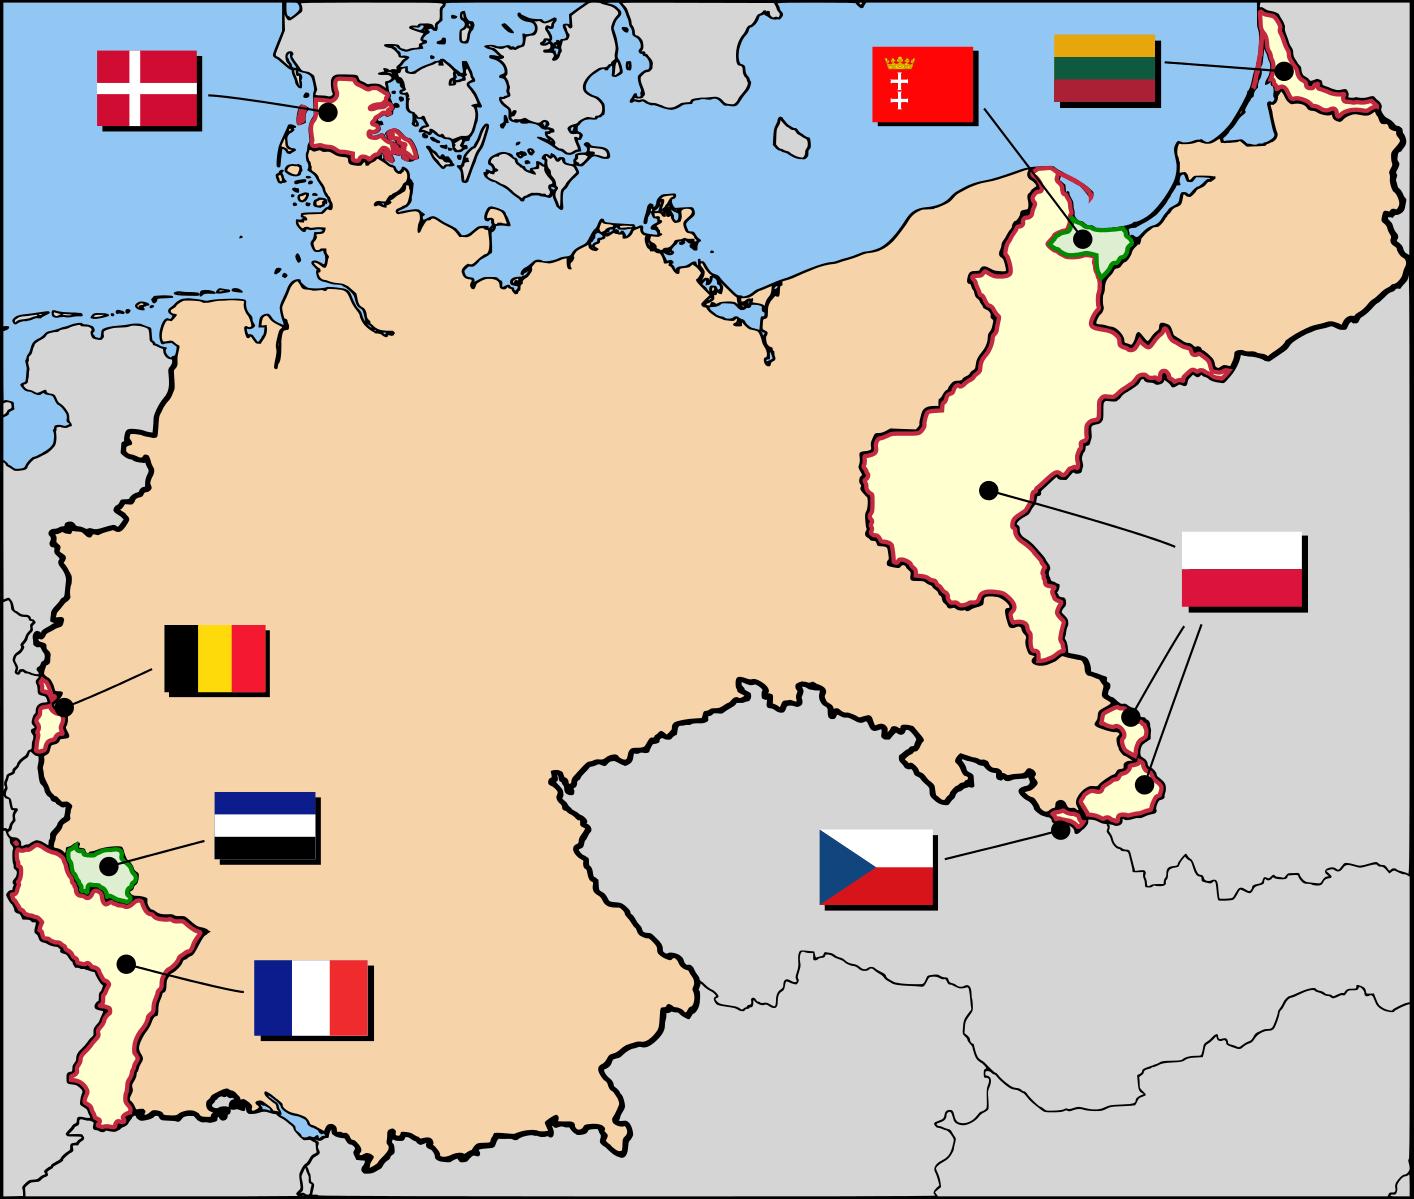 republica-de-weimar-bandera